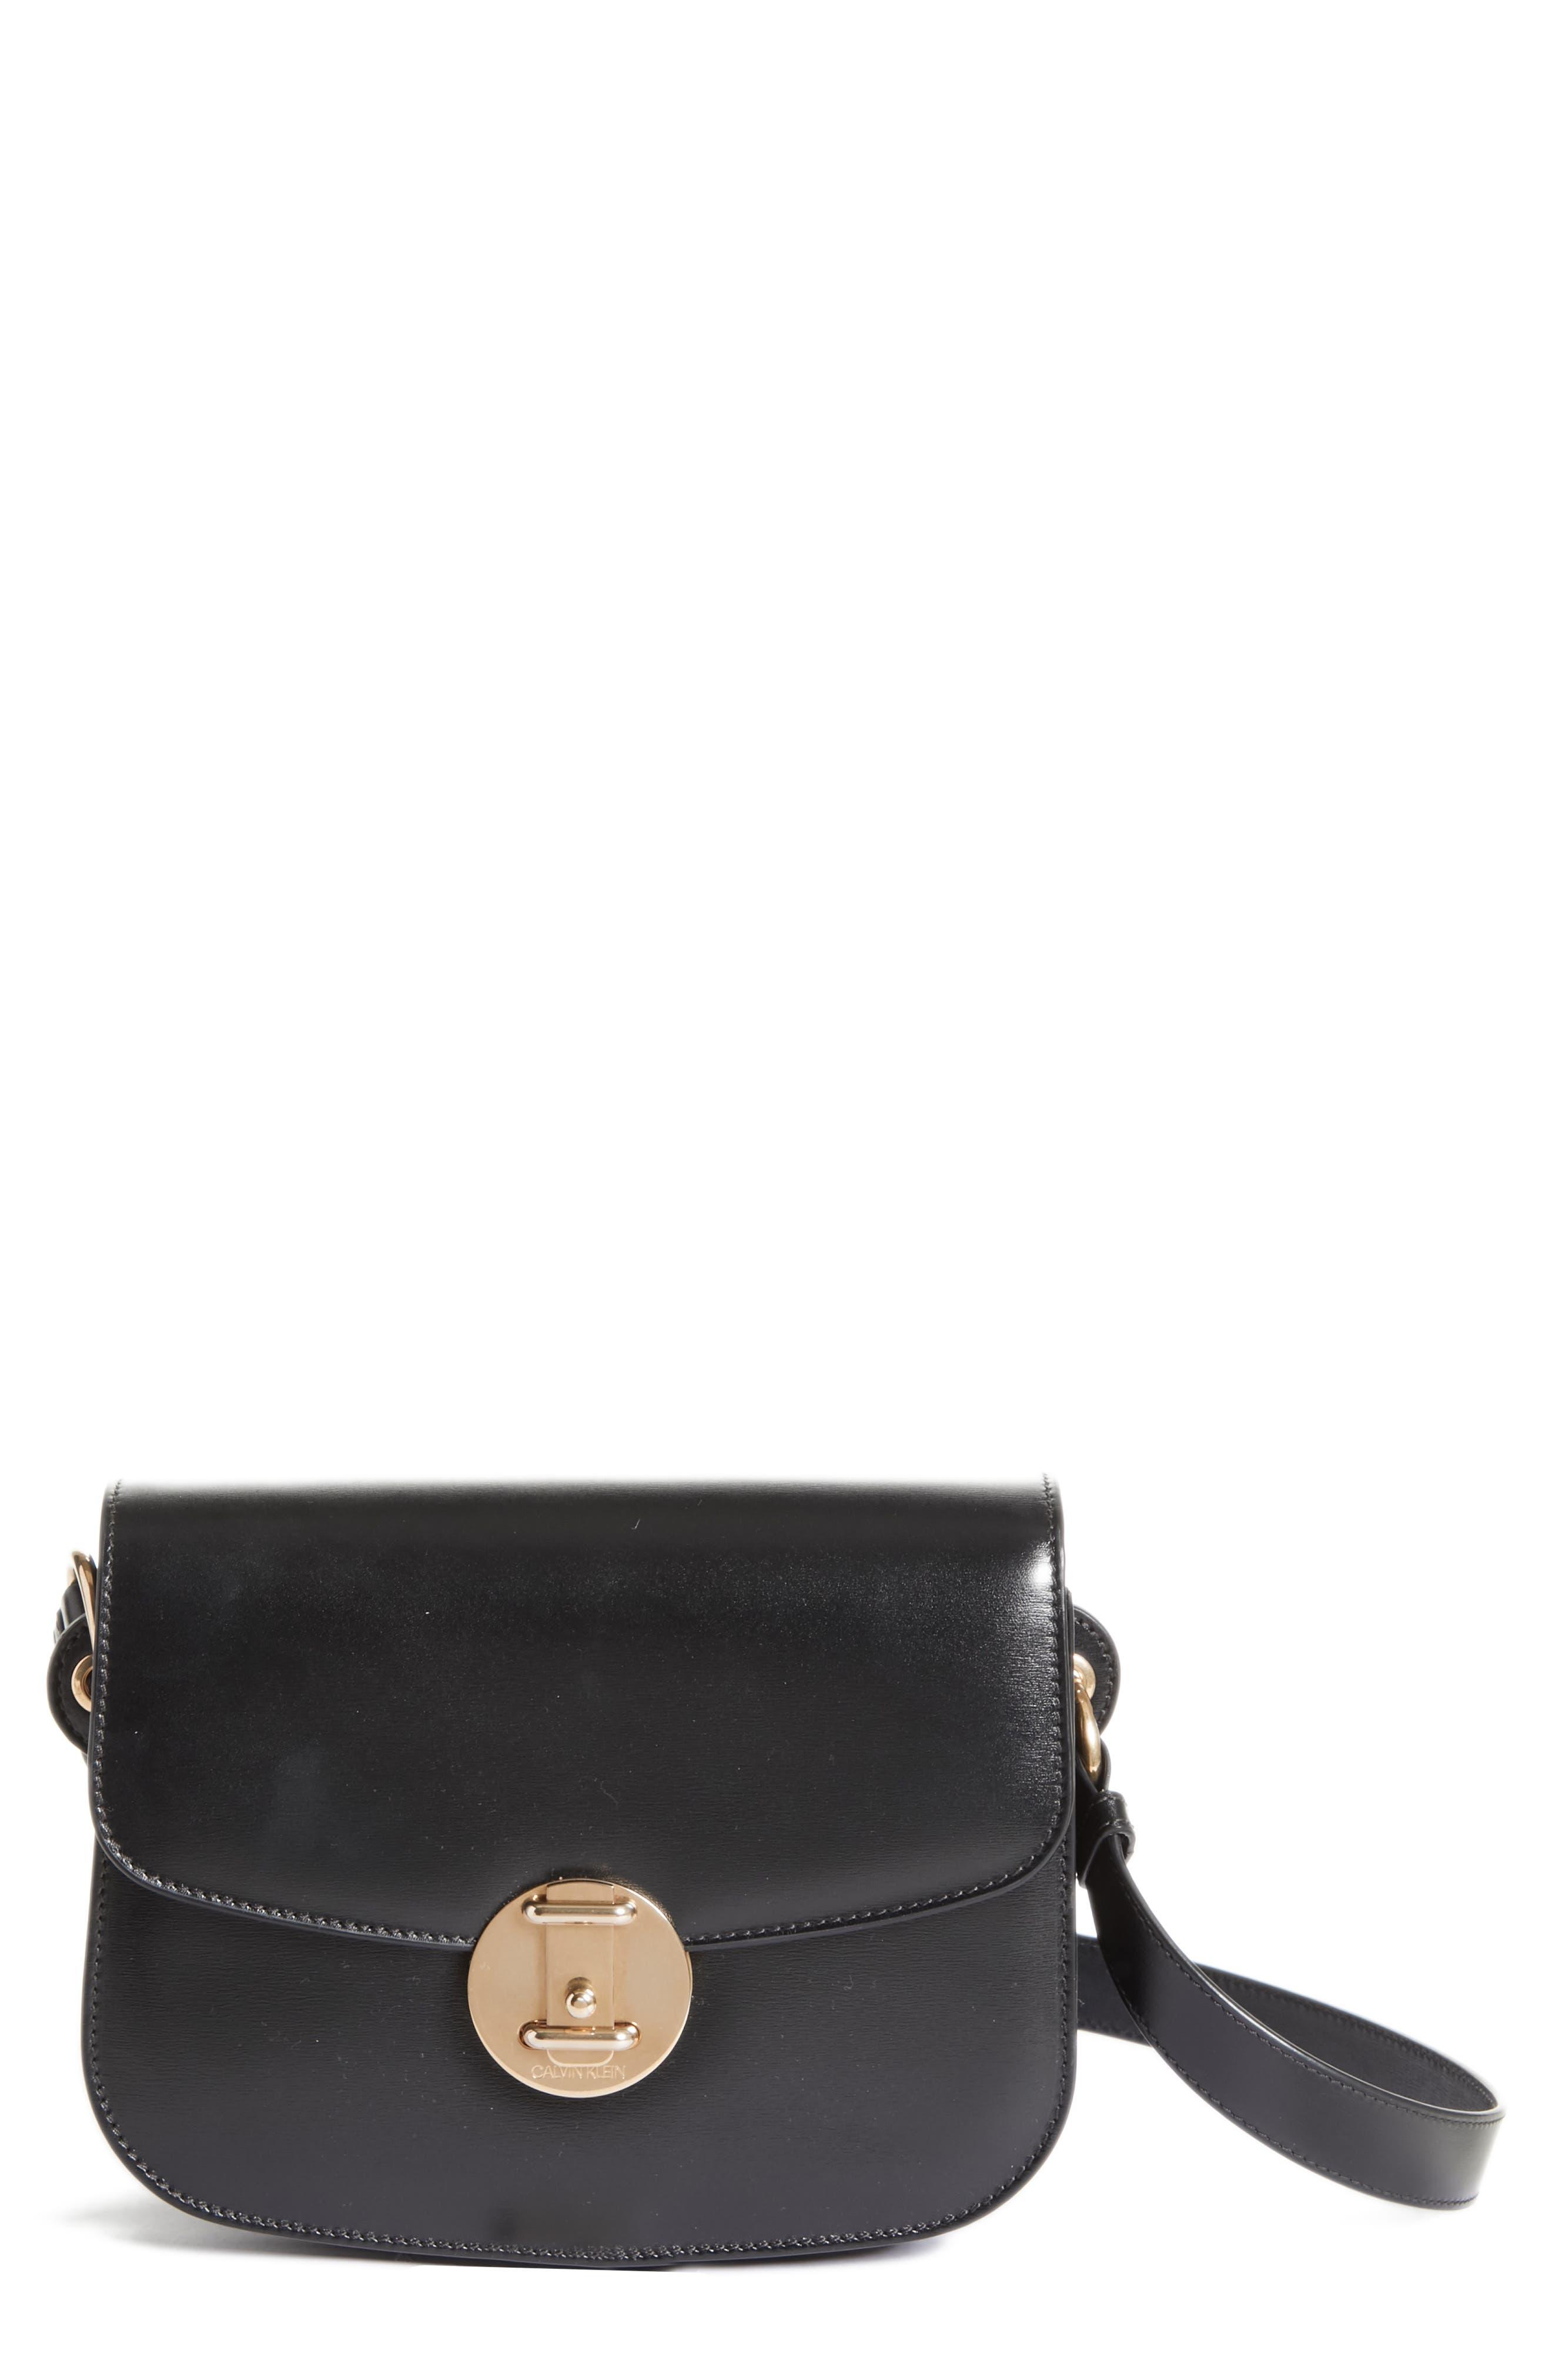 CALVIN KLEIN 209W39NYC Small Round Lock Shoulder Bag,                             Main thumbnail 1, color,                             BLACK